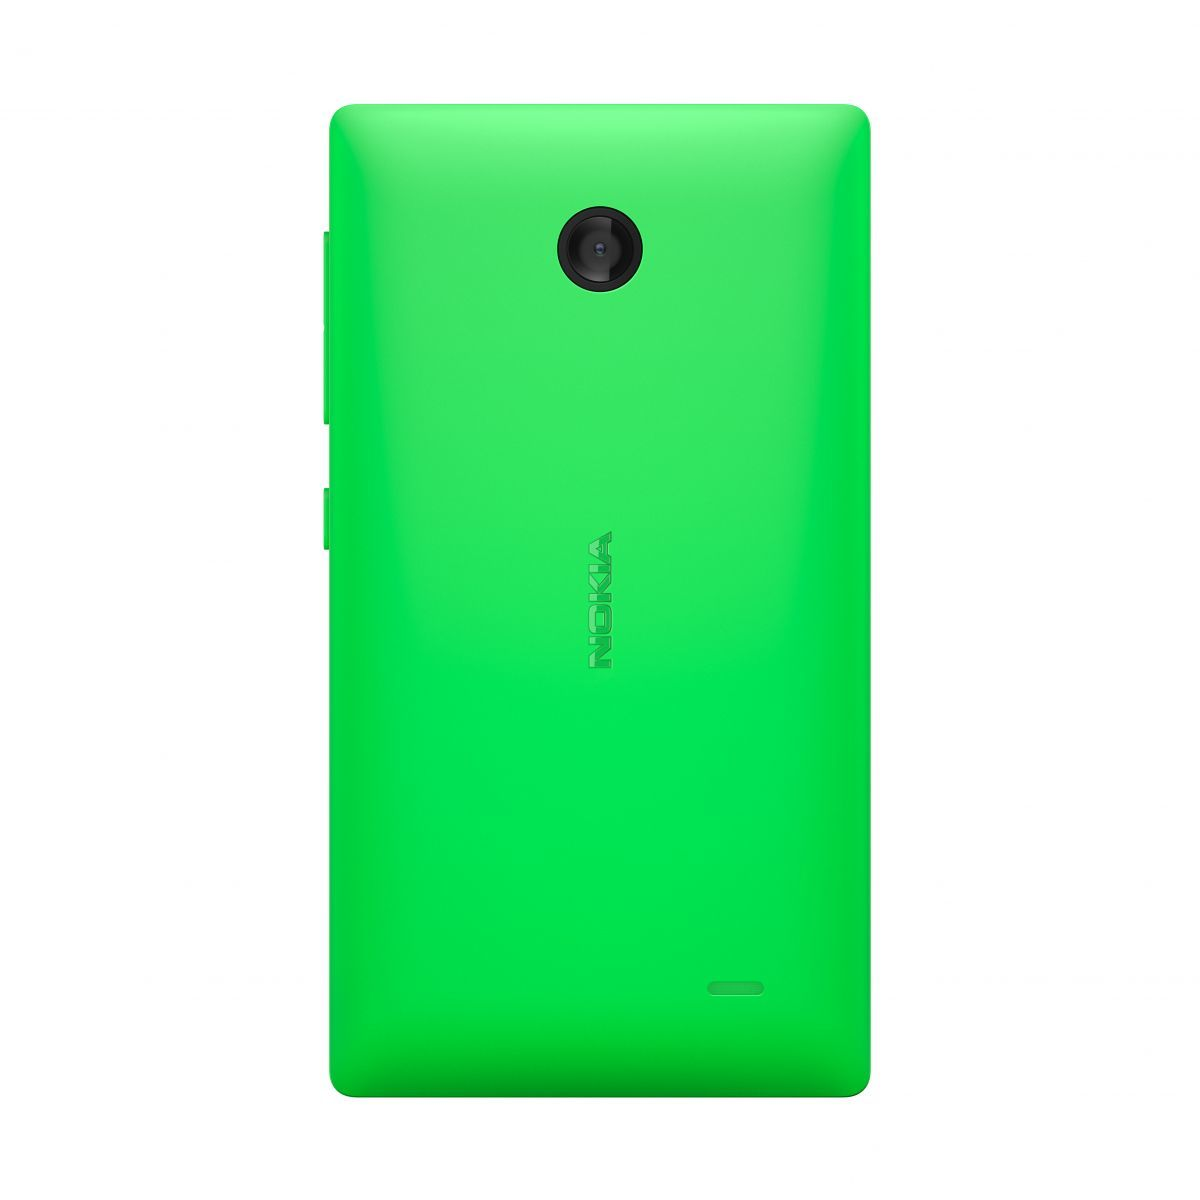 Foto de Nokia X Familia (3/15)